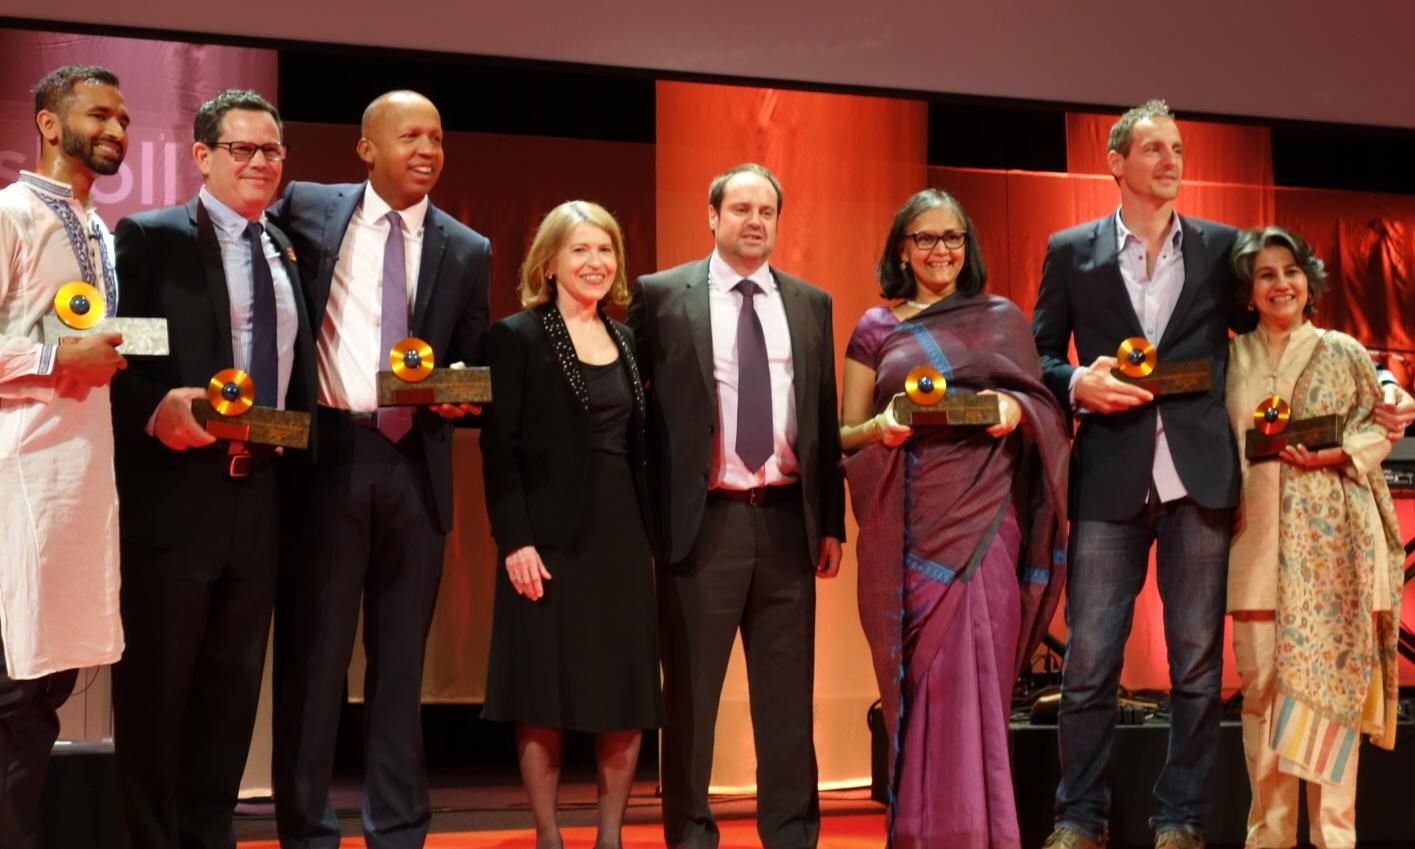 Skoll Awardees Vivek Maru, Chuck Slaughter, Bryan Stevenson,Skoll Foundation CEO Sally Osberg, Jeff Skoll, and Skoll Awardees Mallika Dutt, Oren Yakobovich and Sonali Khan.